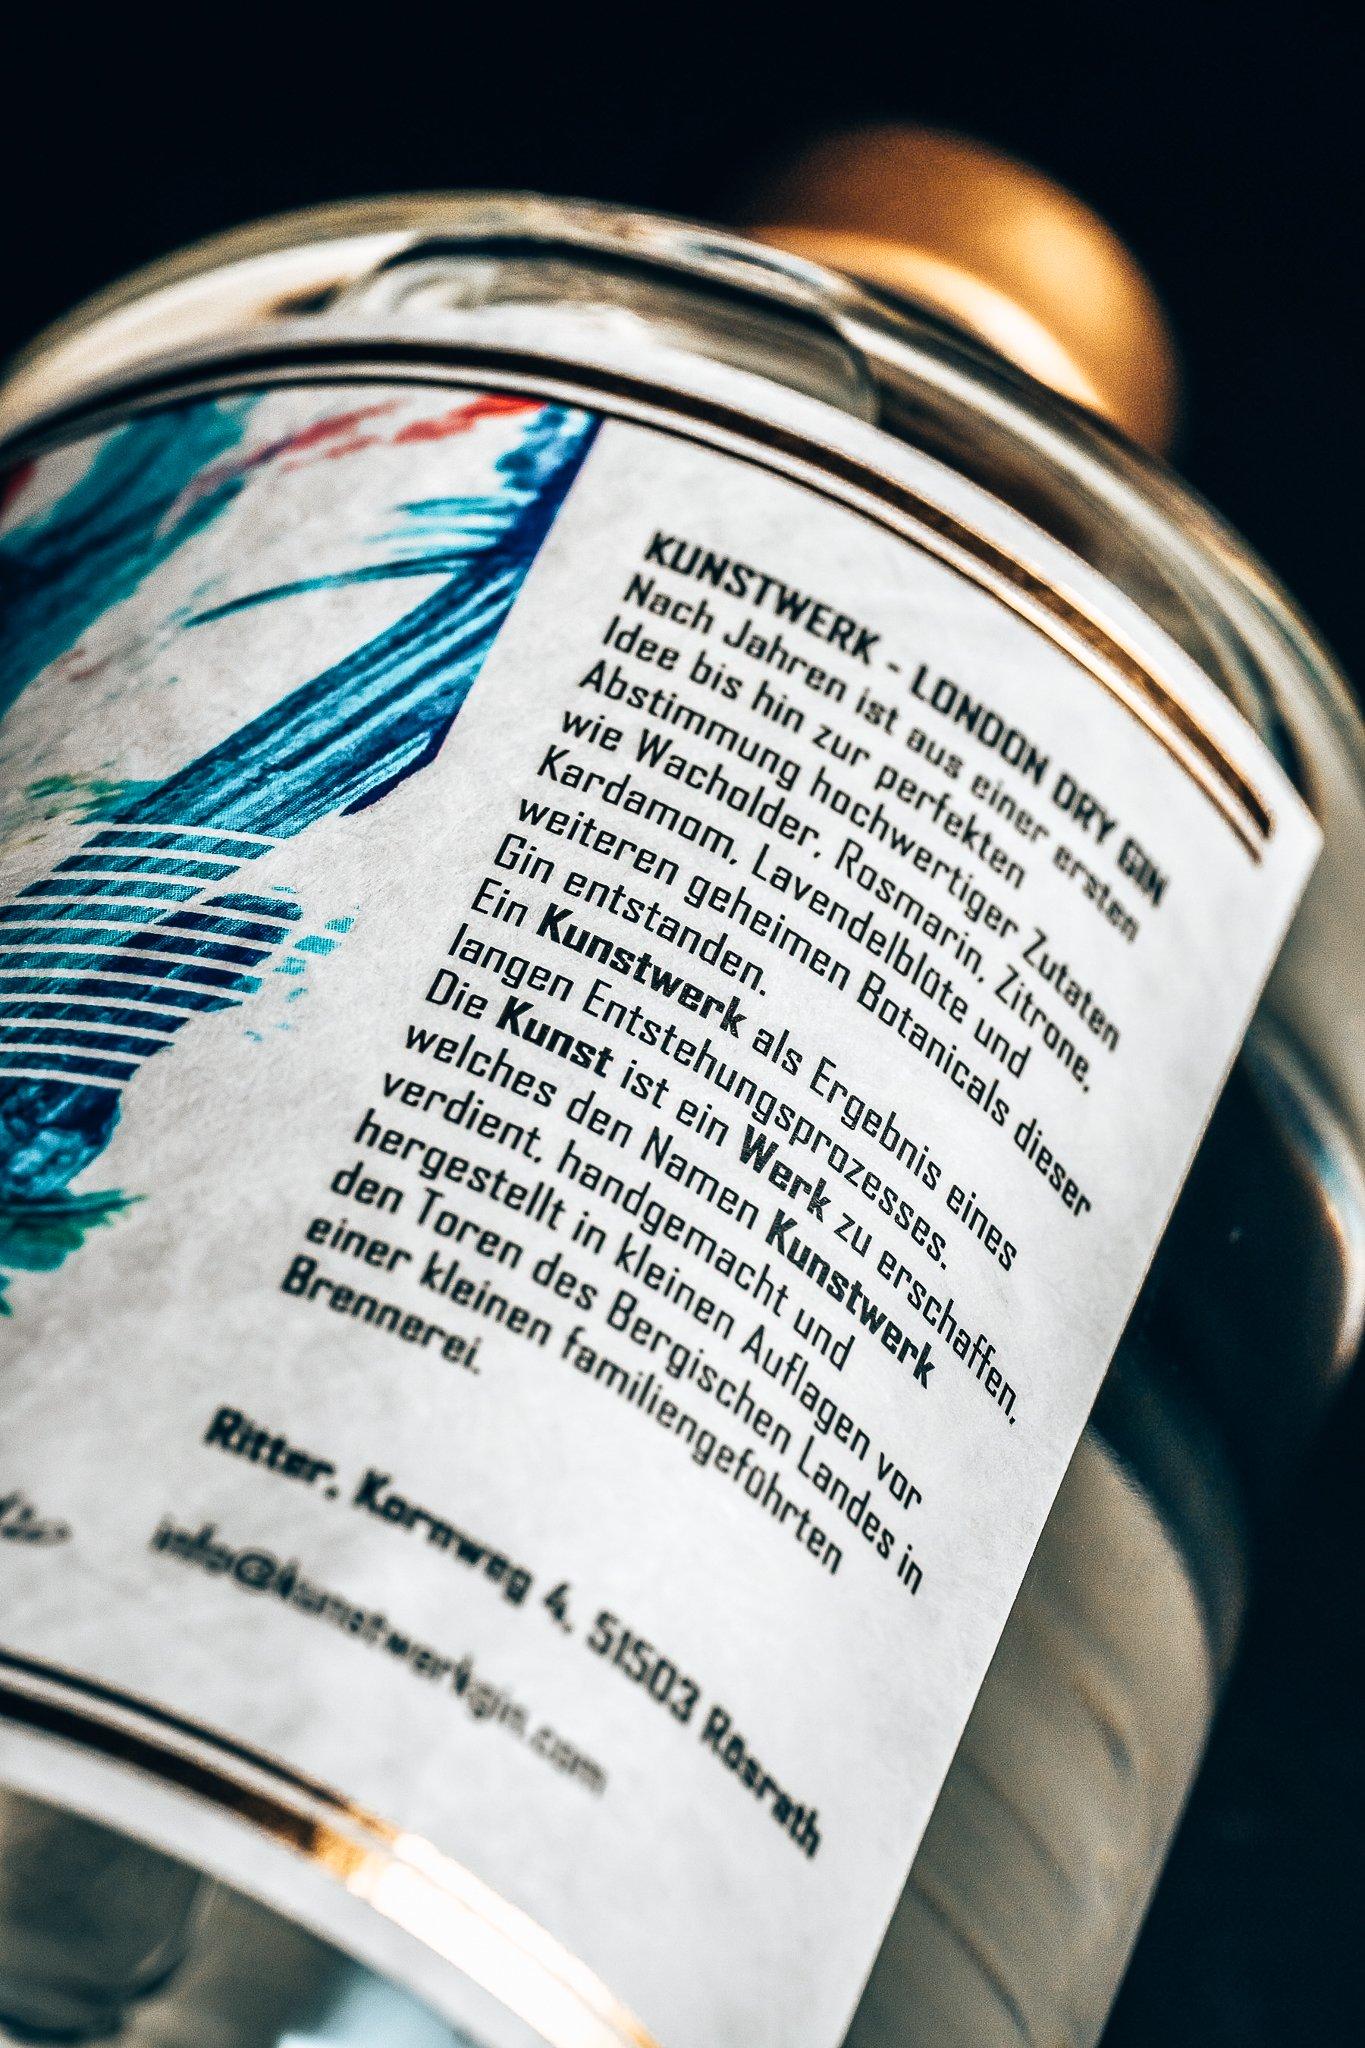 Kunstwerkgin label achterzijde, Alles over gin.